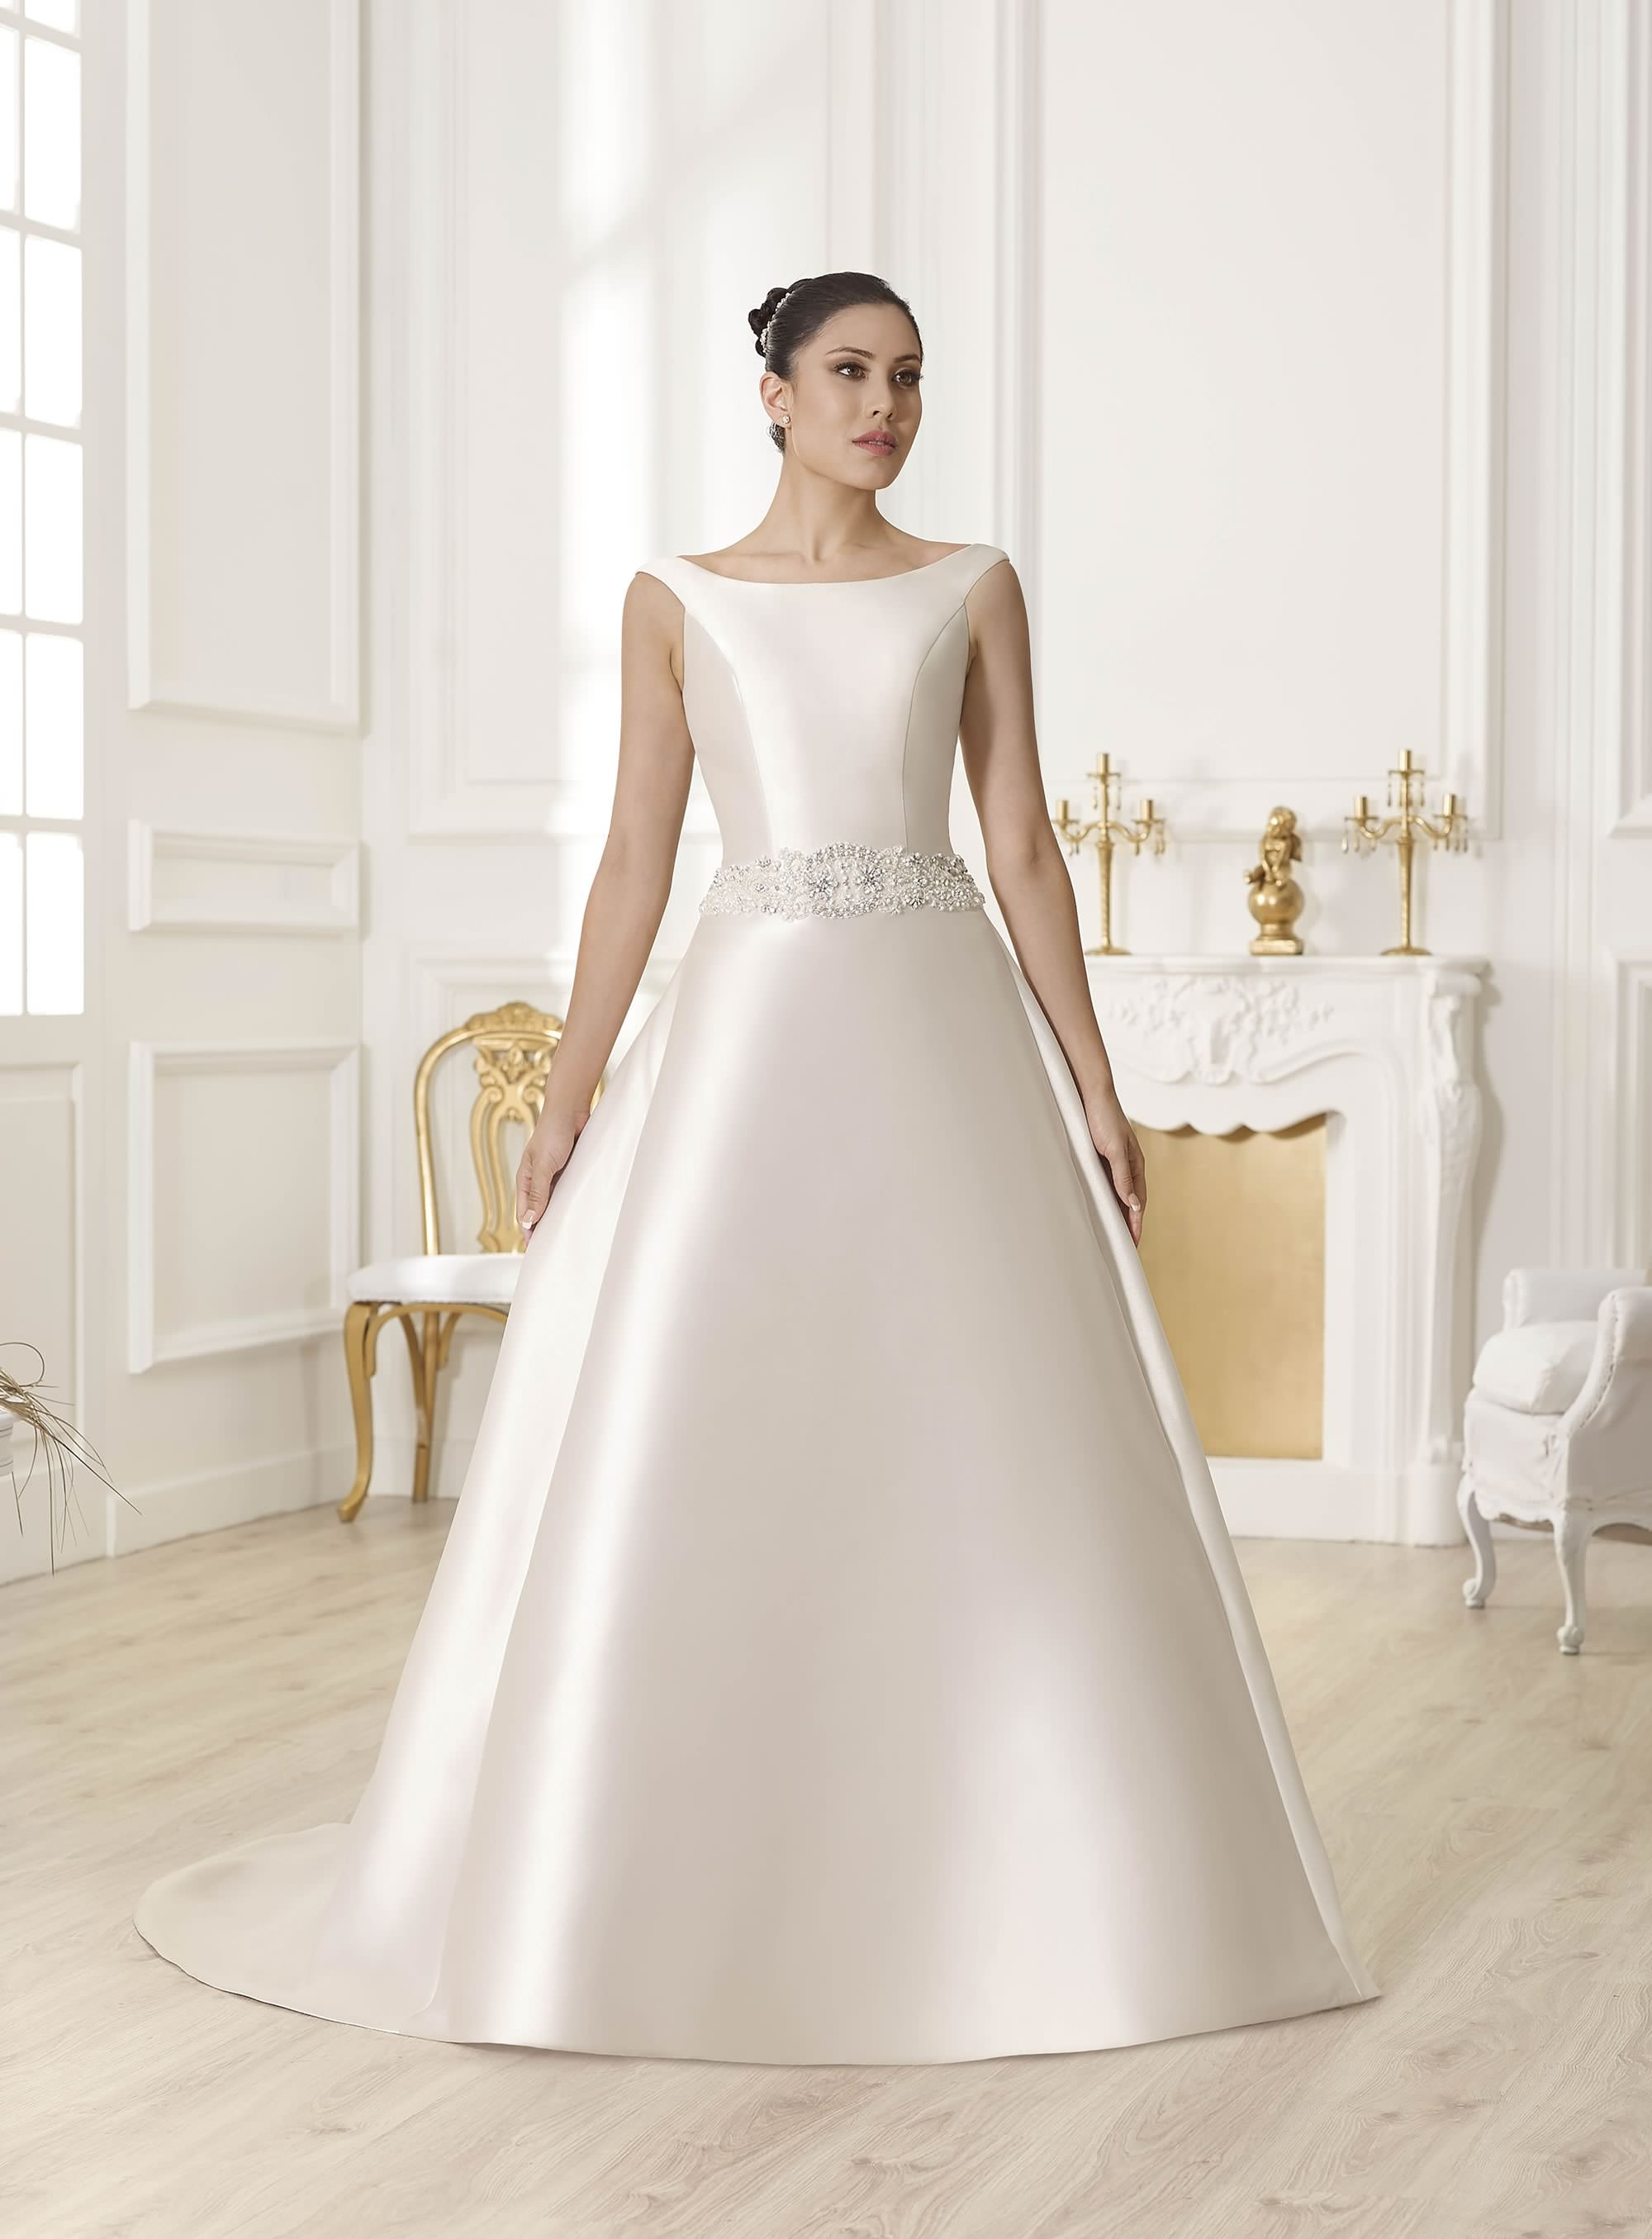 5b8c4a90d TodoBoda.com - 10 vestidos para las que buscan un escote clásico